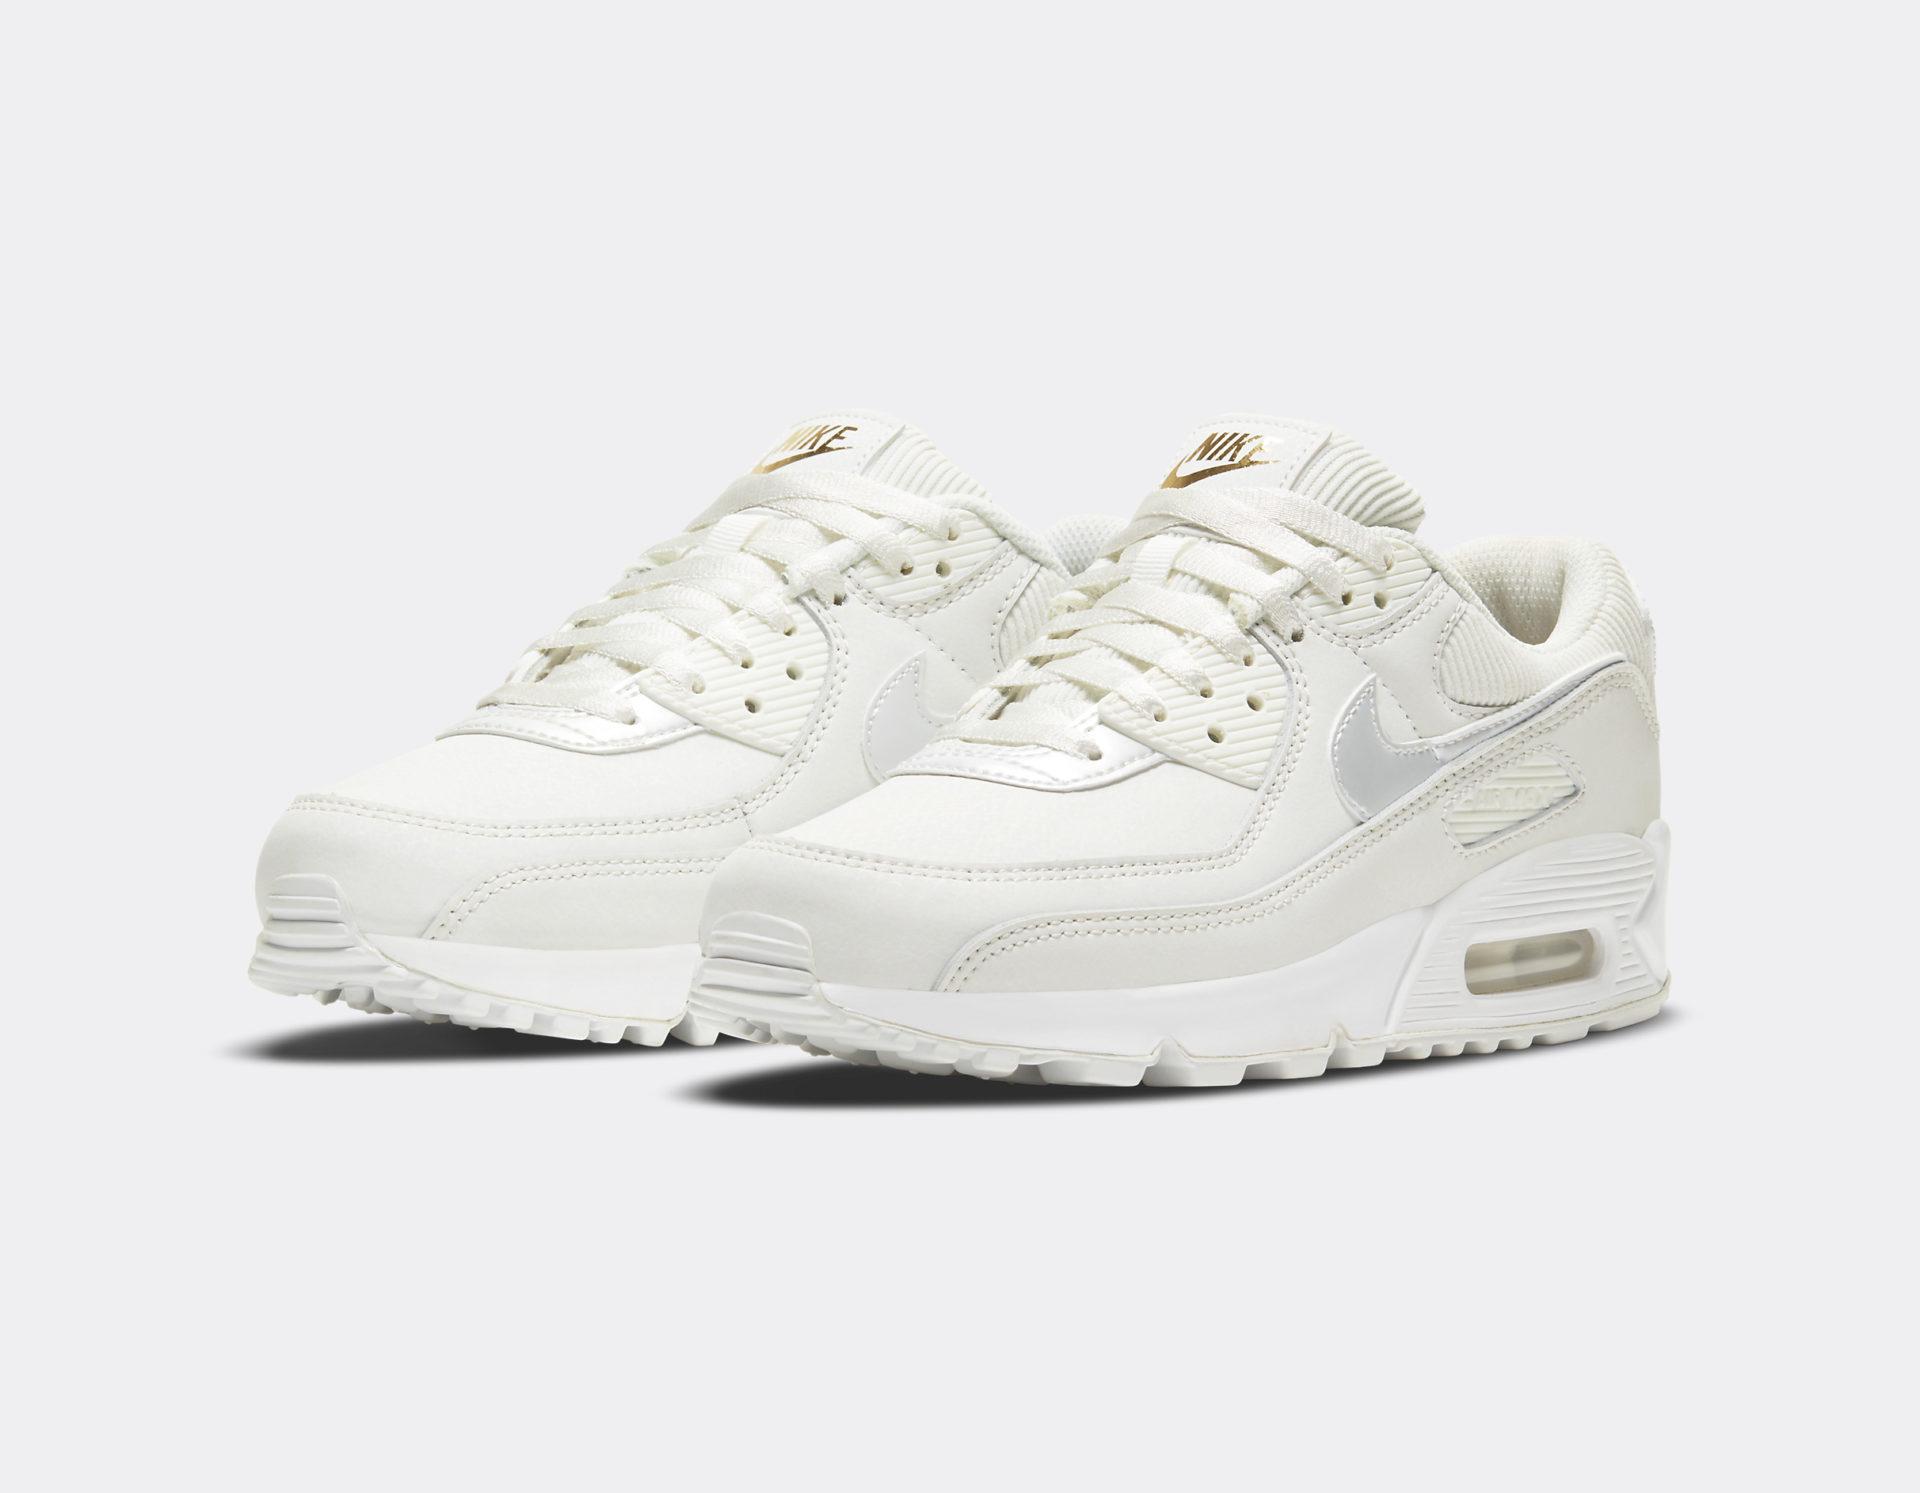 Nike W Air Max 90 Summit White - Sneakers.fr